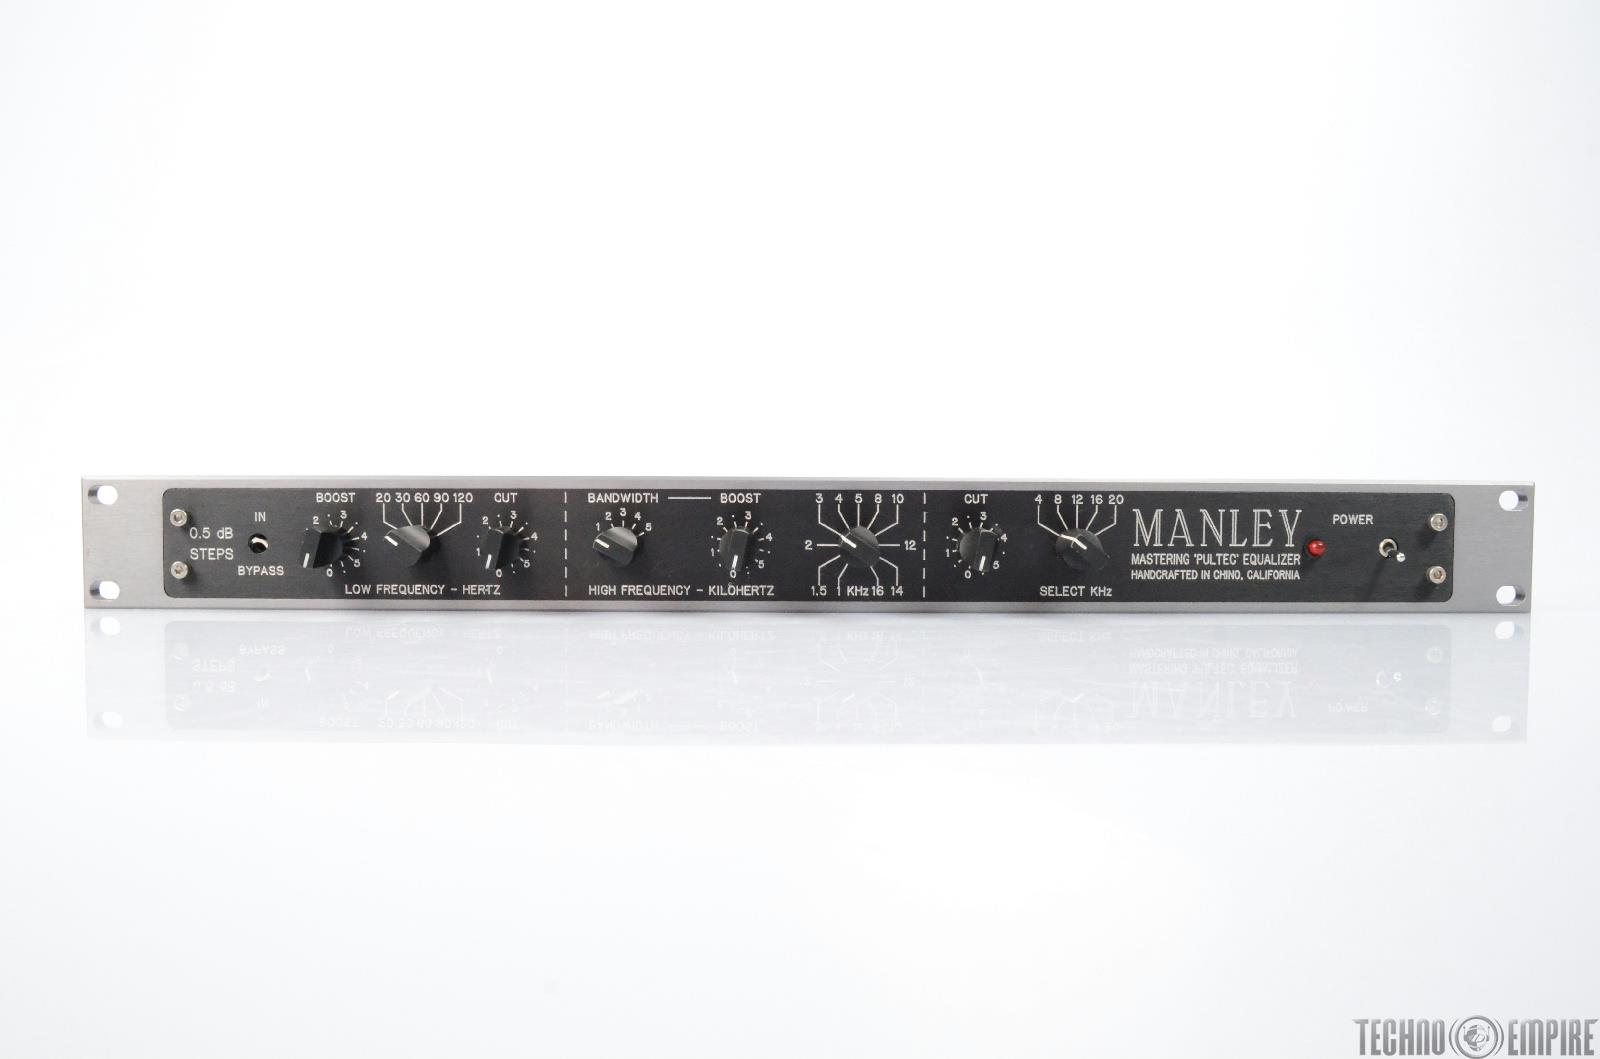 MANLEY Mastering Pultec Equalizer EQP-1A EQ #25706